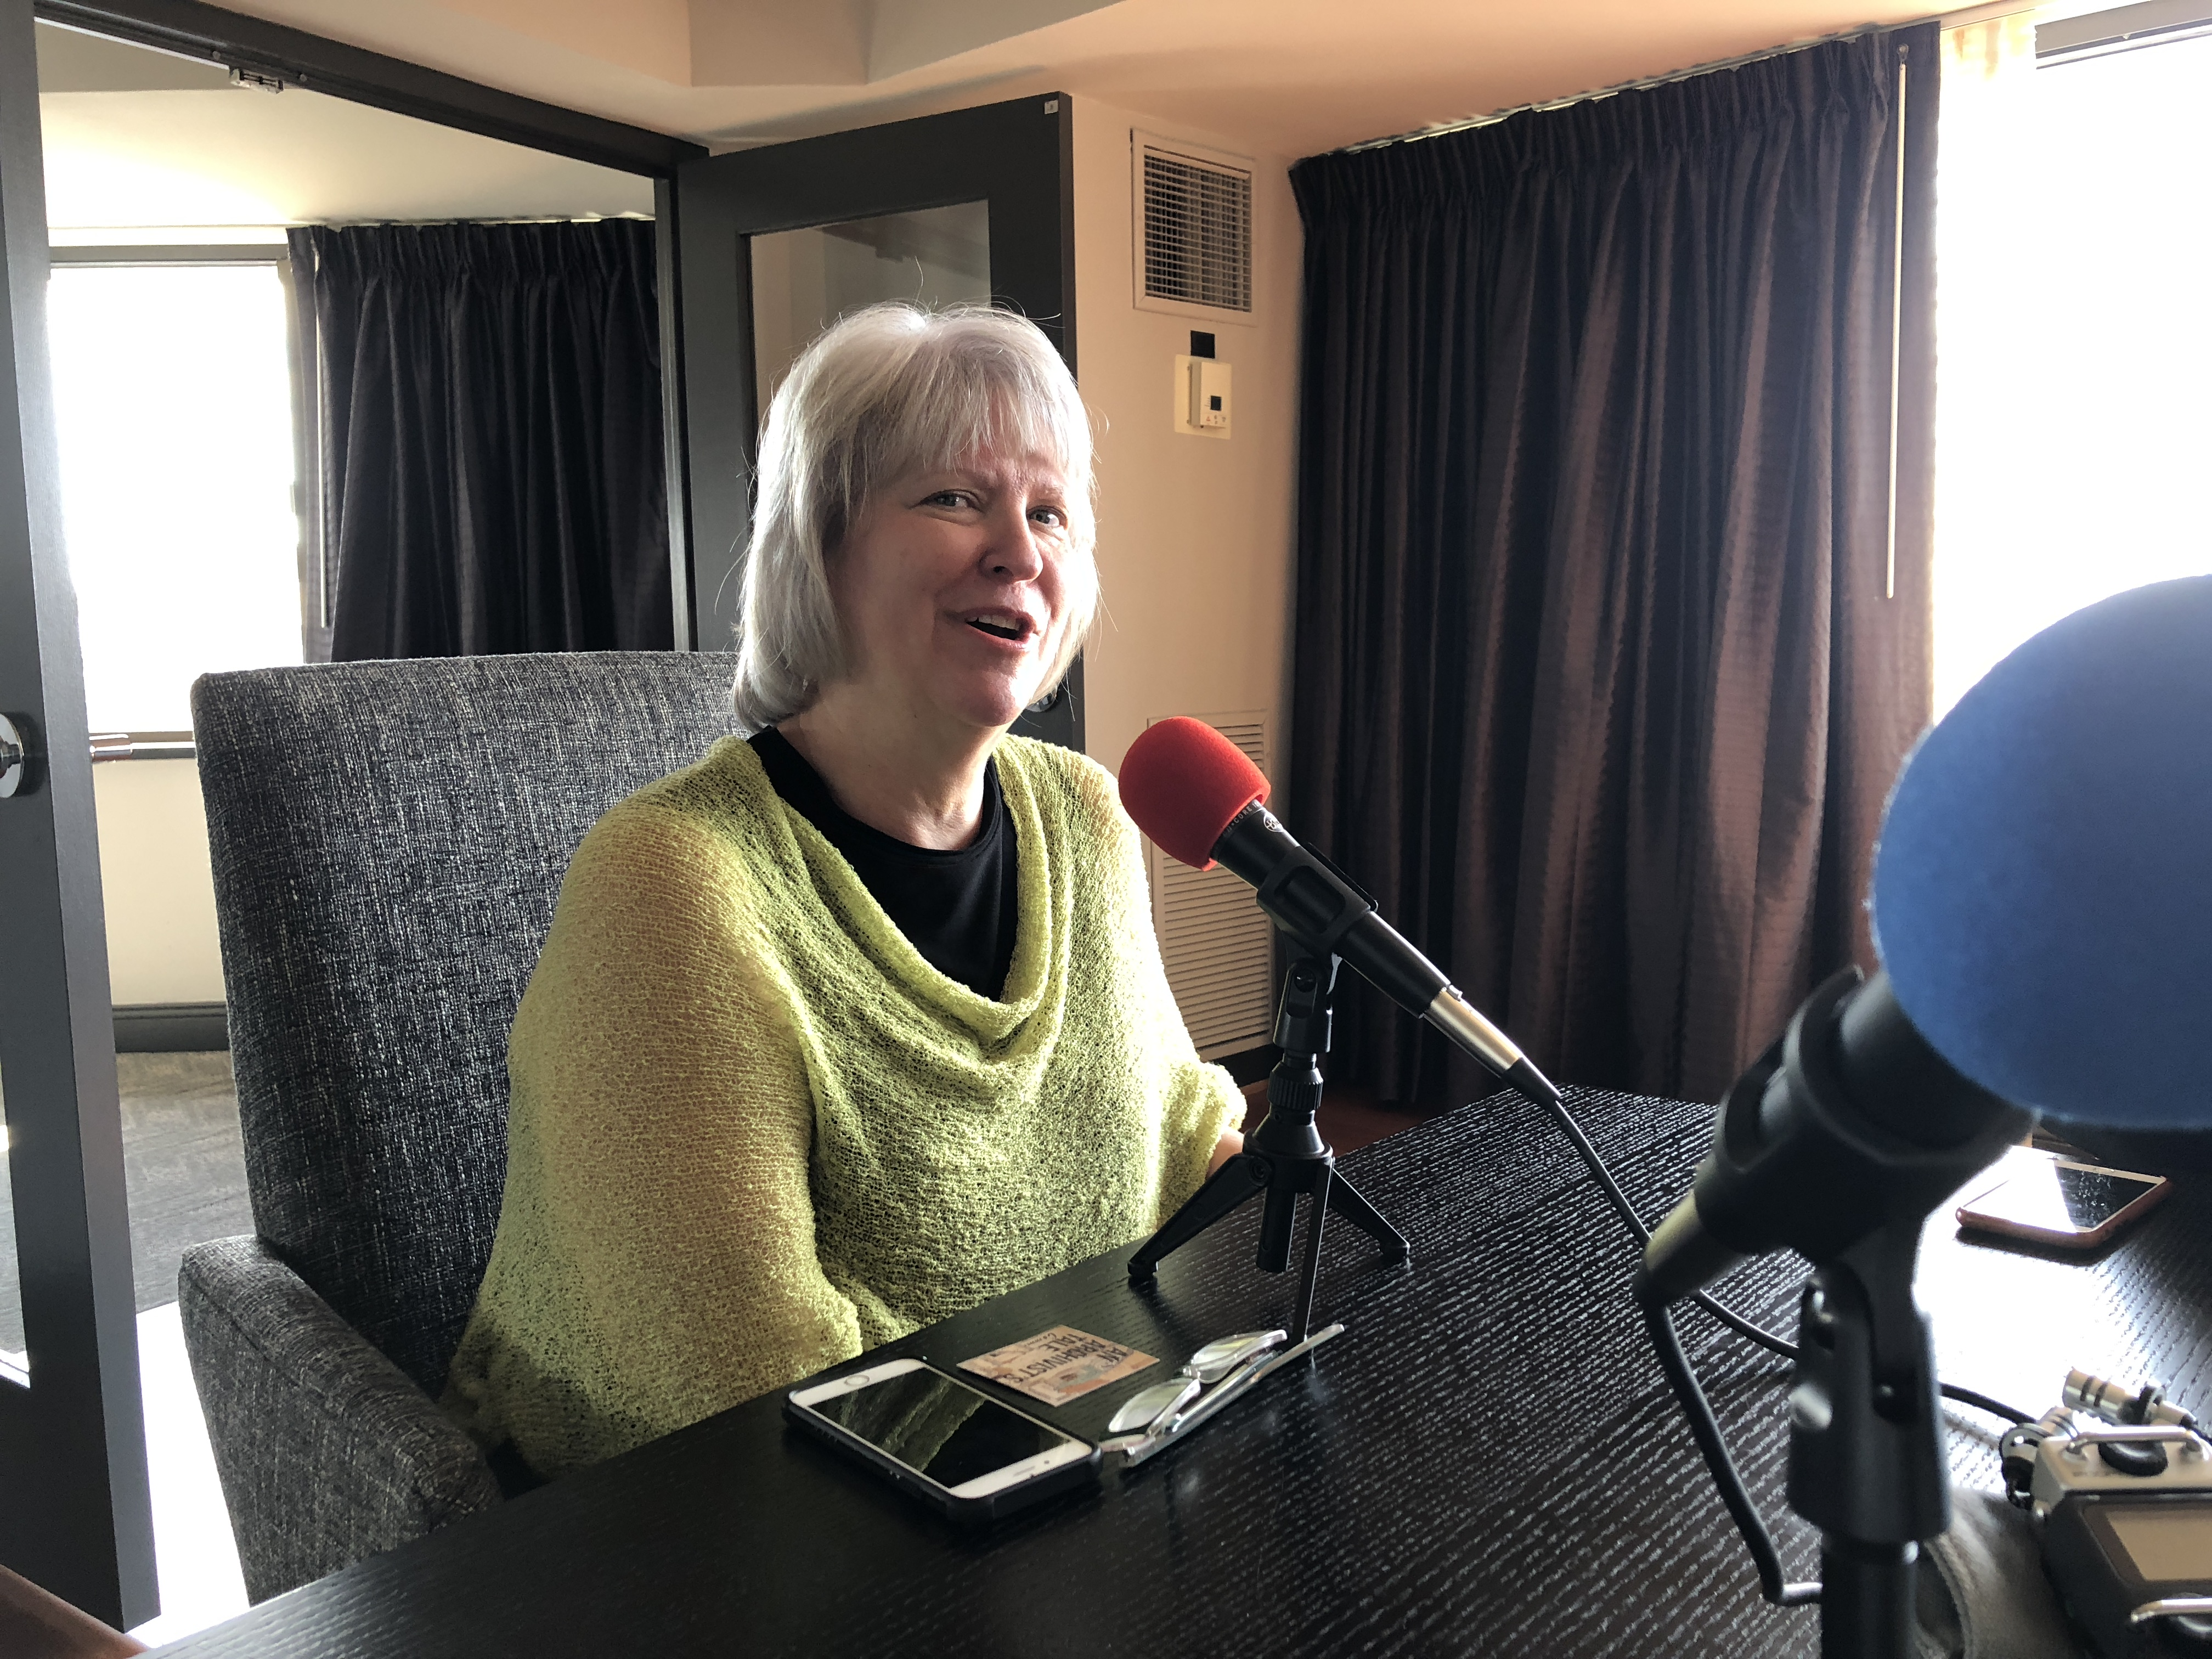 tanya zanish-belcher interviewe d by an archivist's tale (washington, dc, 2018-08-14)